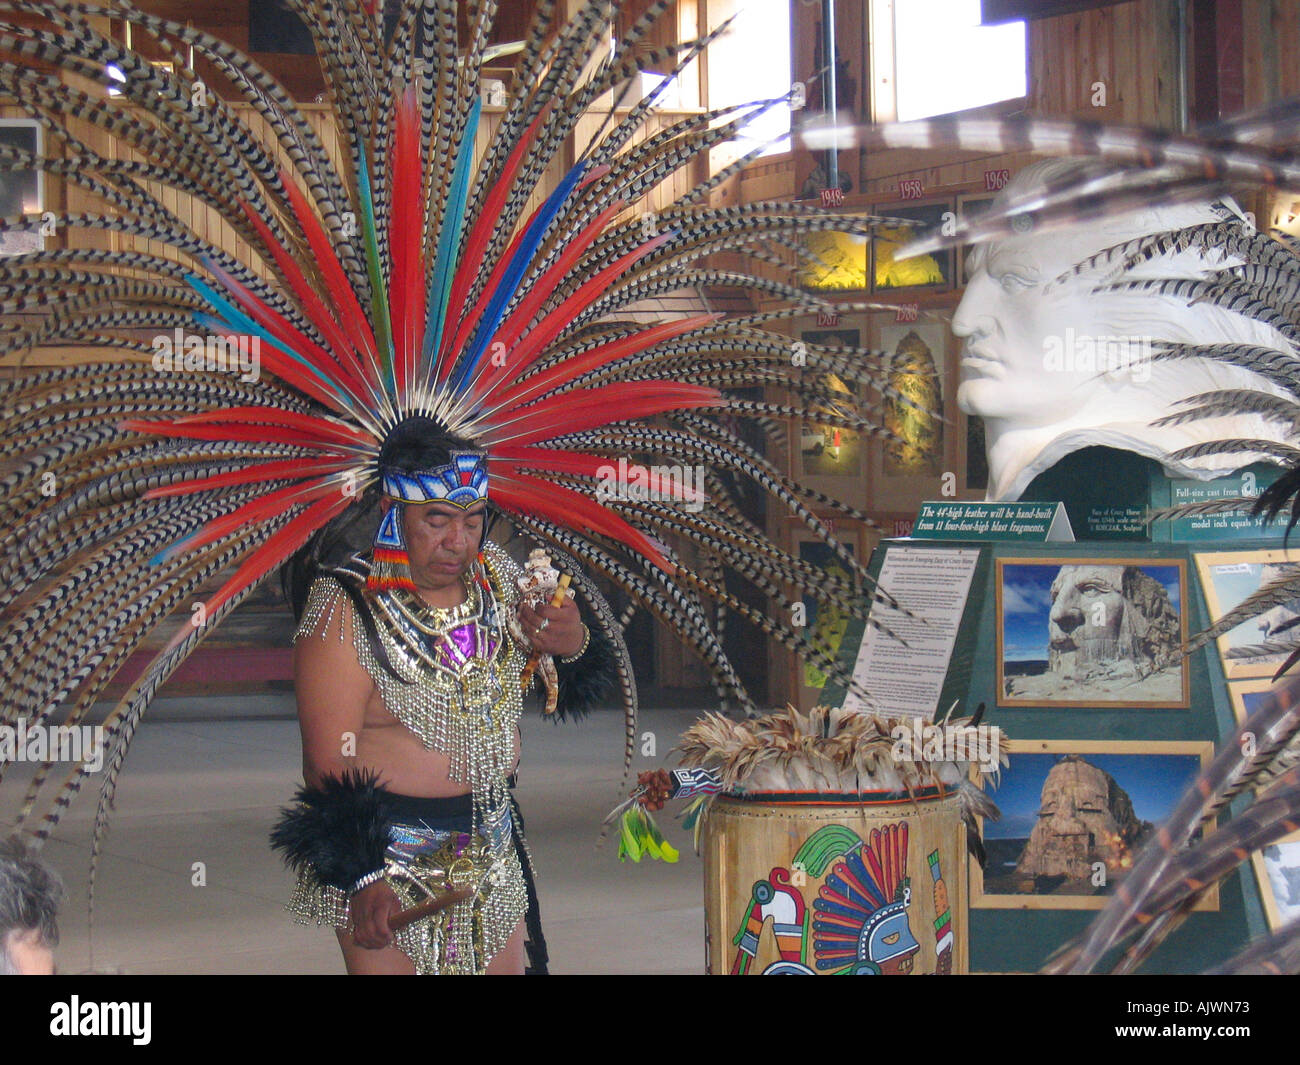 USA South Dakota Sioux Indians Tribal Dance - Stock Image